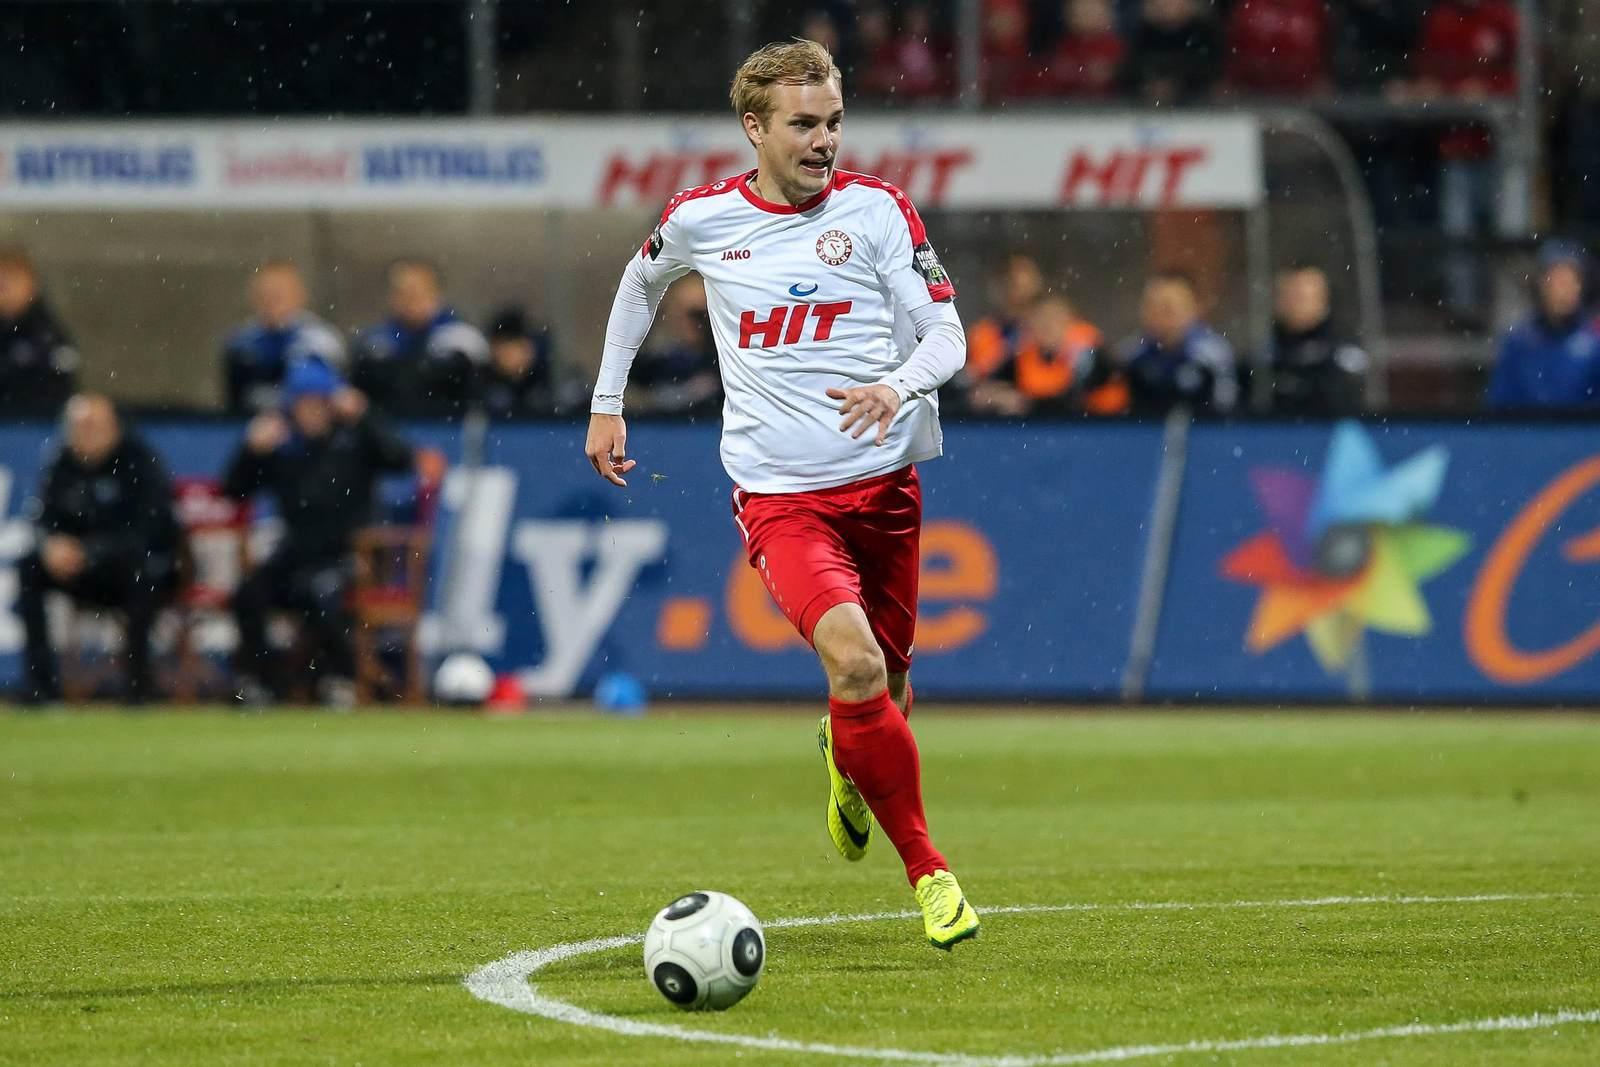 Cimo Röcker am Ball für Fortuna Köln